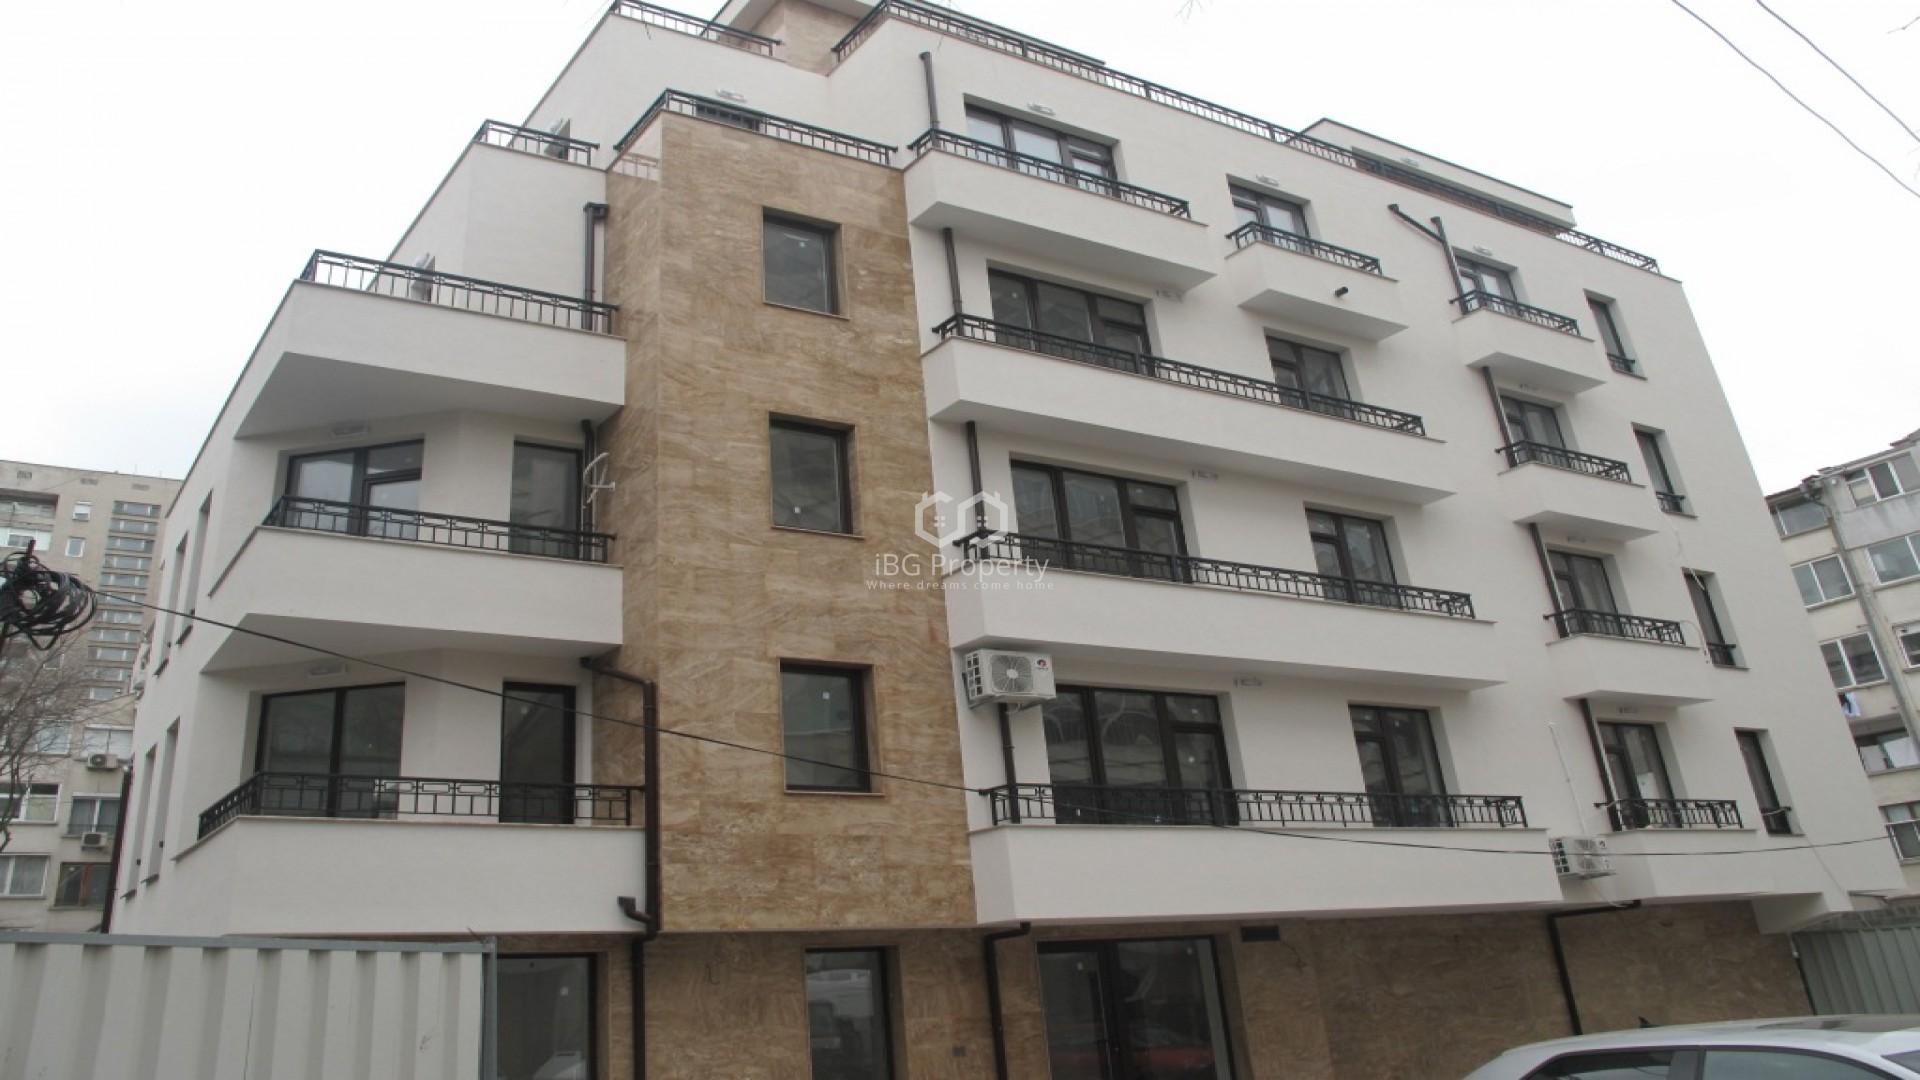 Трехкомнатная квартира Център Бургас  107 m2